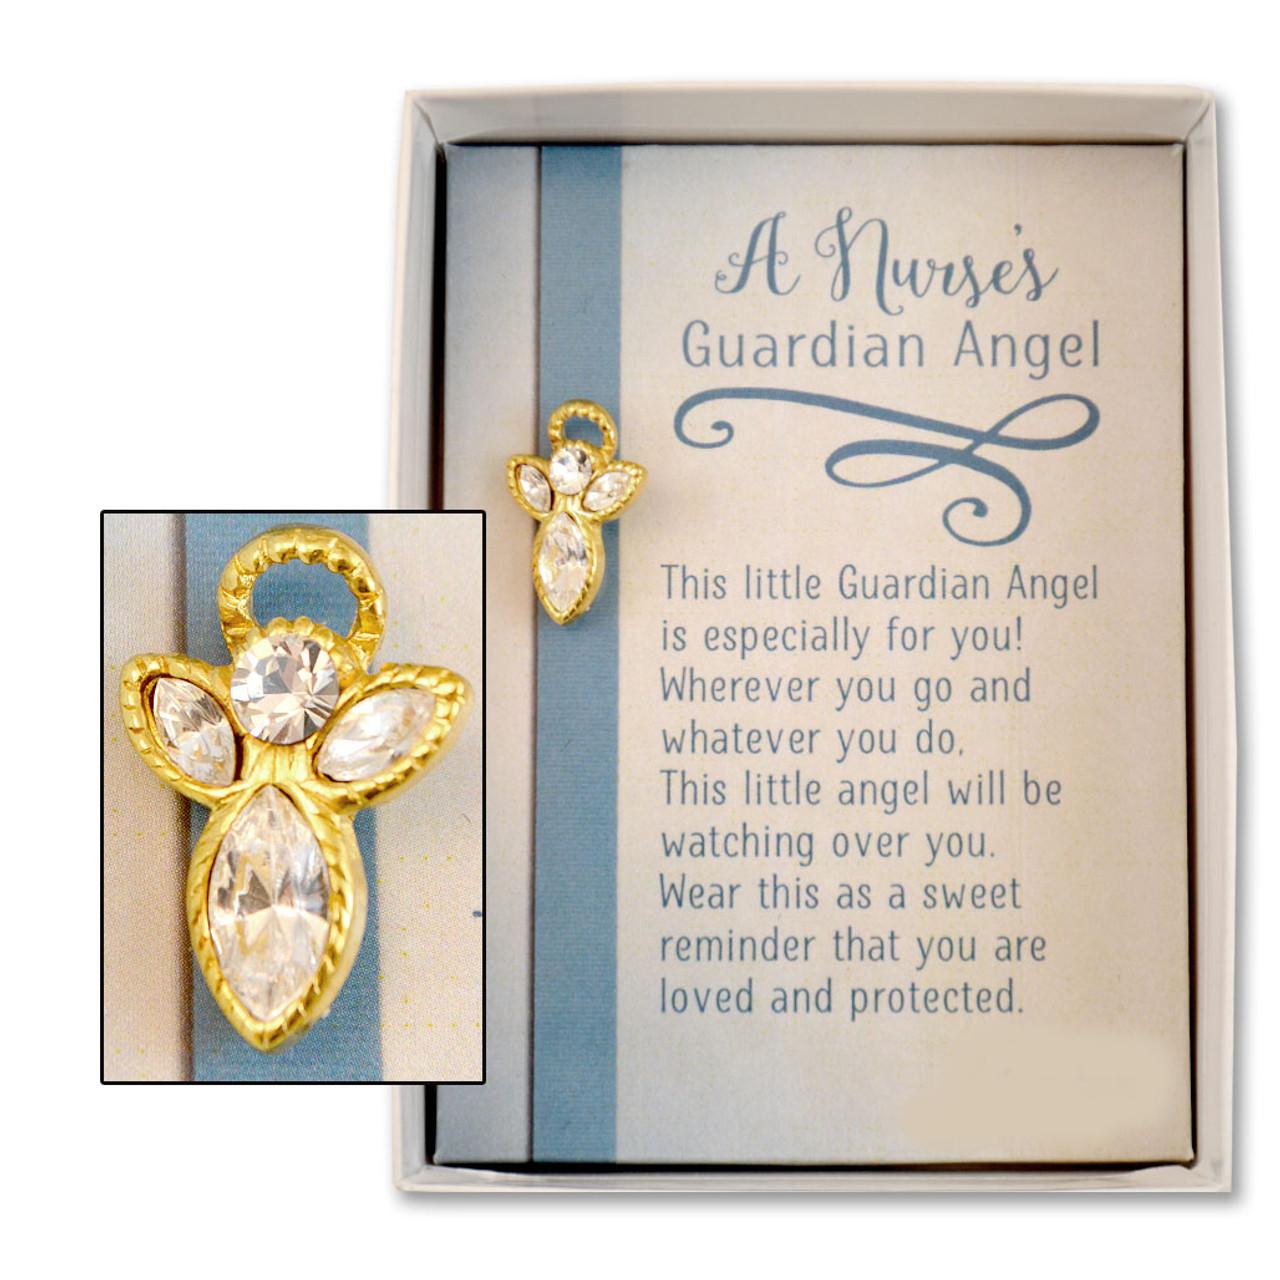 Guardian Angel Pin for Nurses